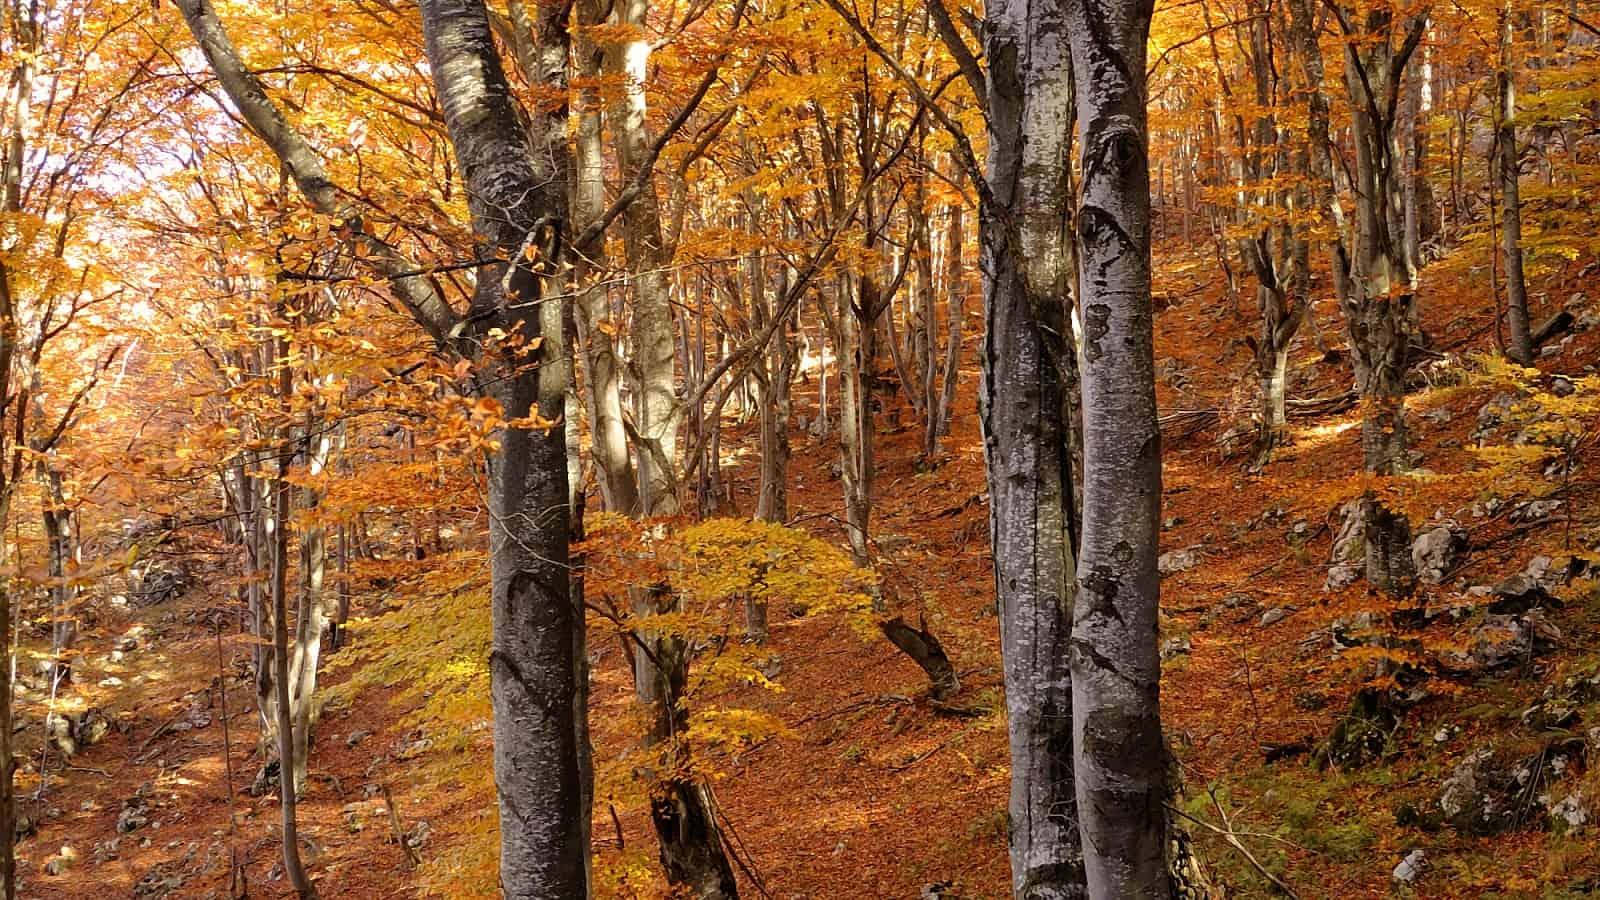 Im Herbstwald - Foto: Naturpark Vachranski Balkan/Krasimir Lakovski